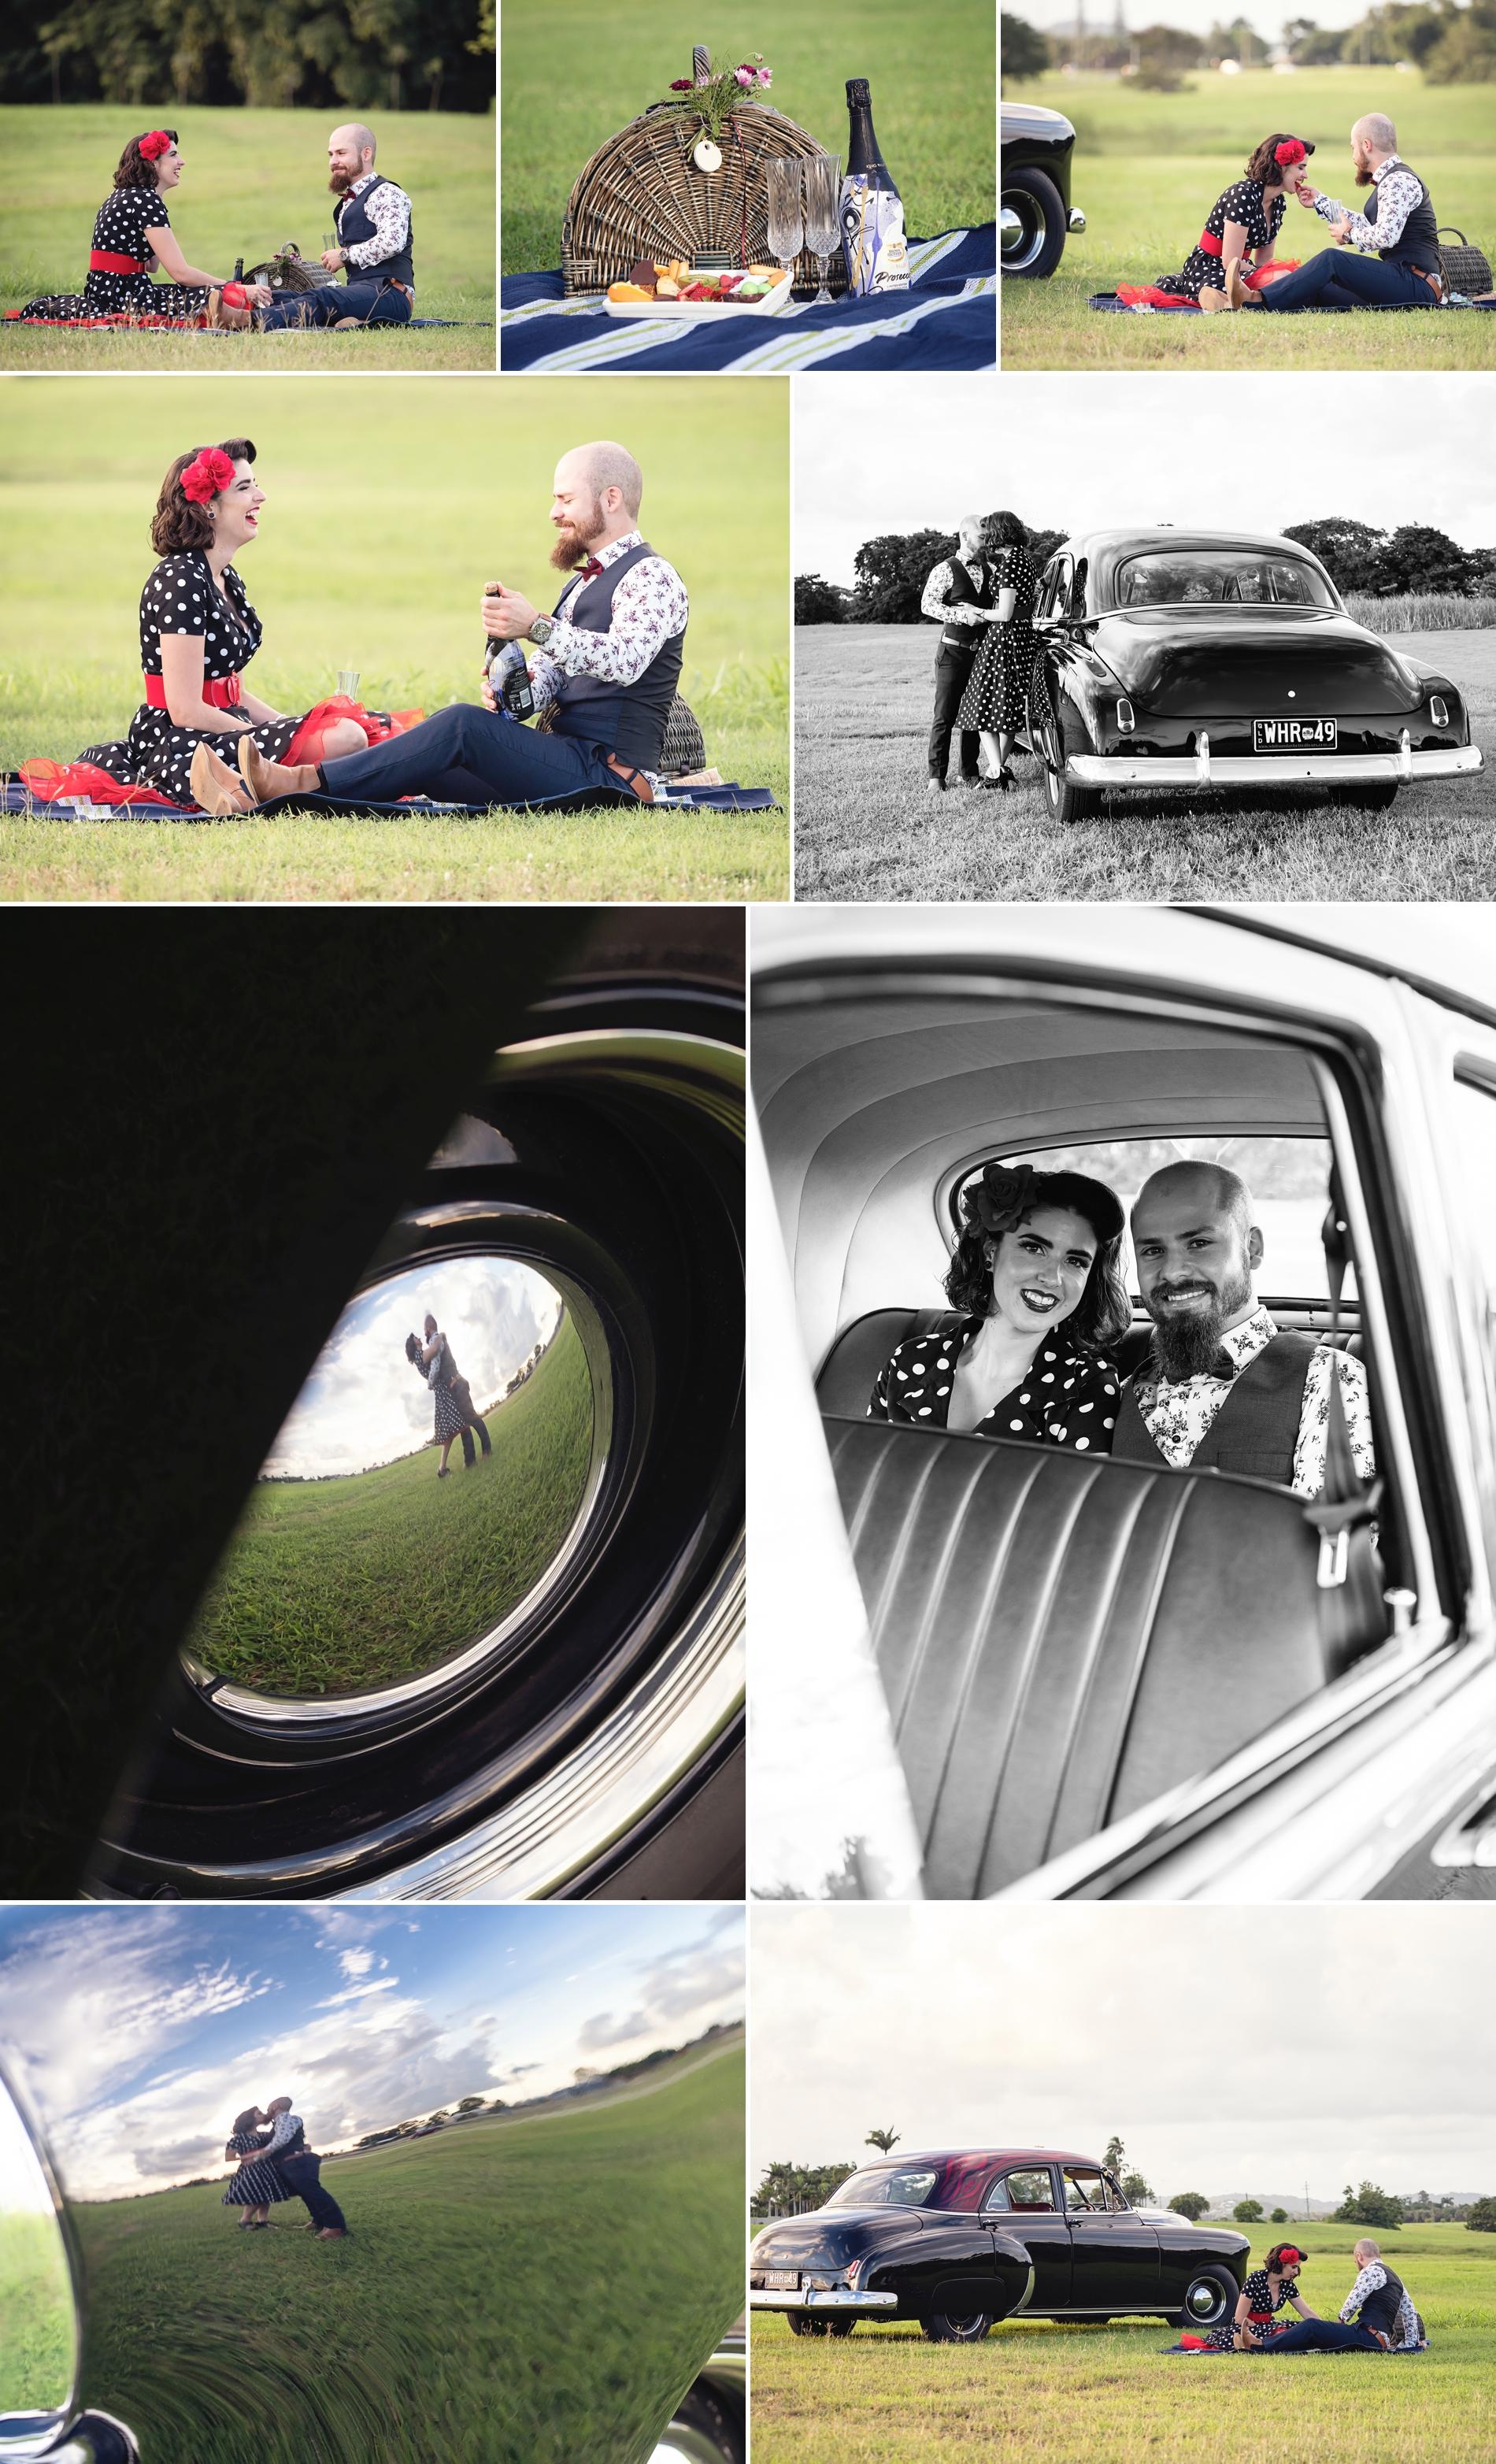 Couple-picnic-hot-rod-botanic-gardens-mackay.jpg